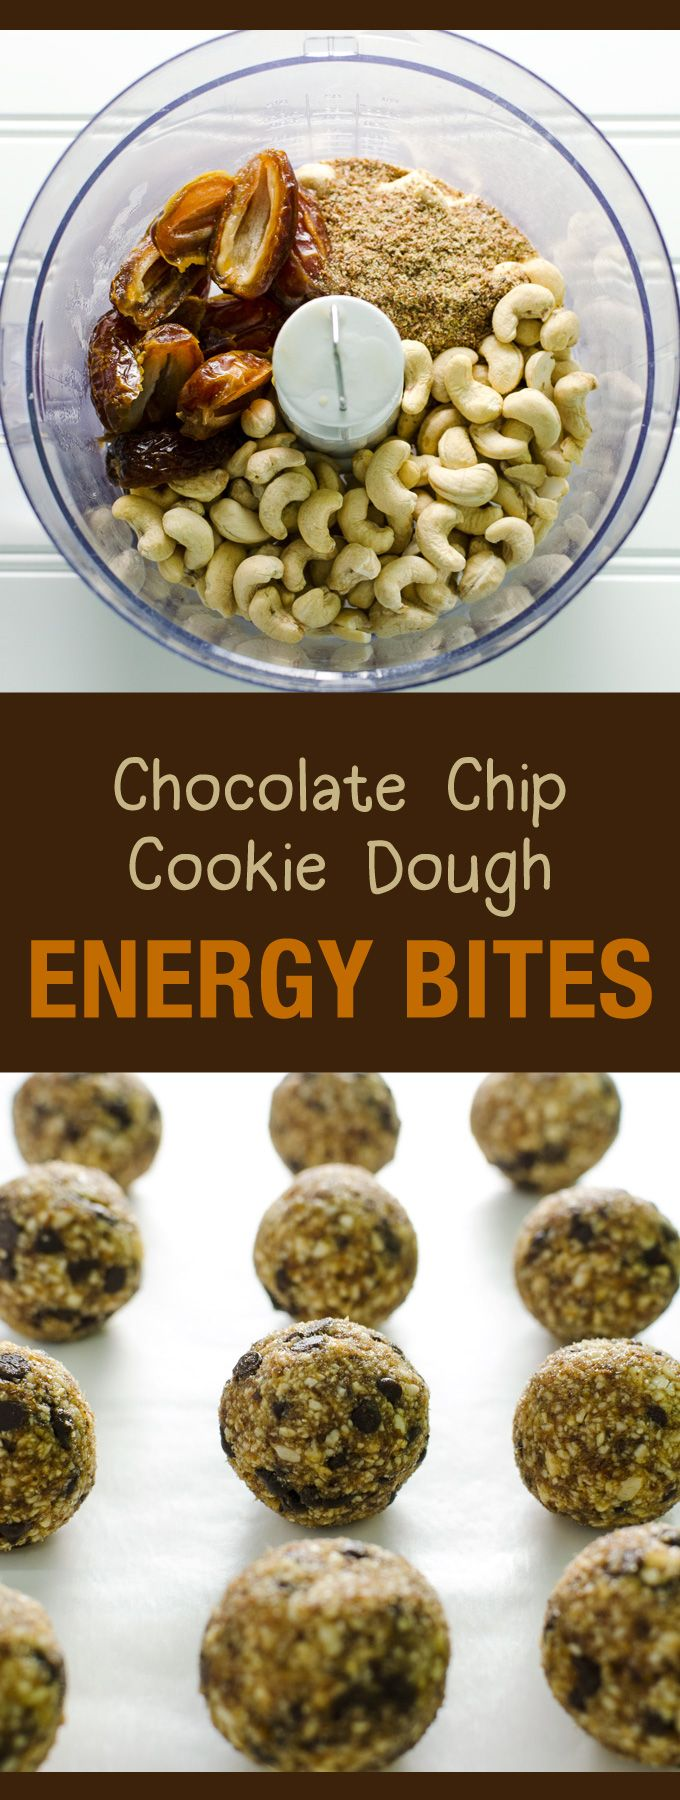 Chocolate Chip Cookie Dough Energy Bites  - a healthy snack or dessert - easy recipe - vegan and gluten free | VeggiePrimer.com